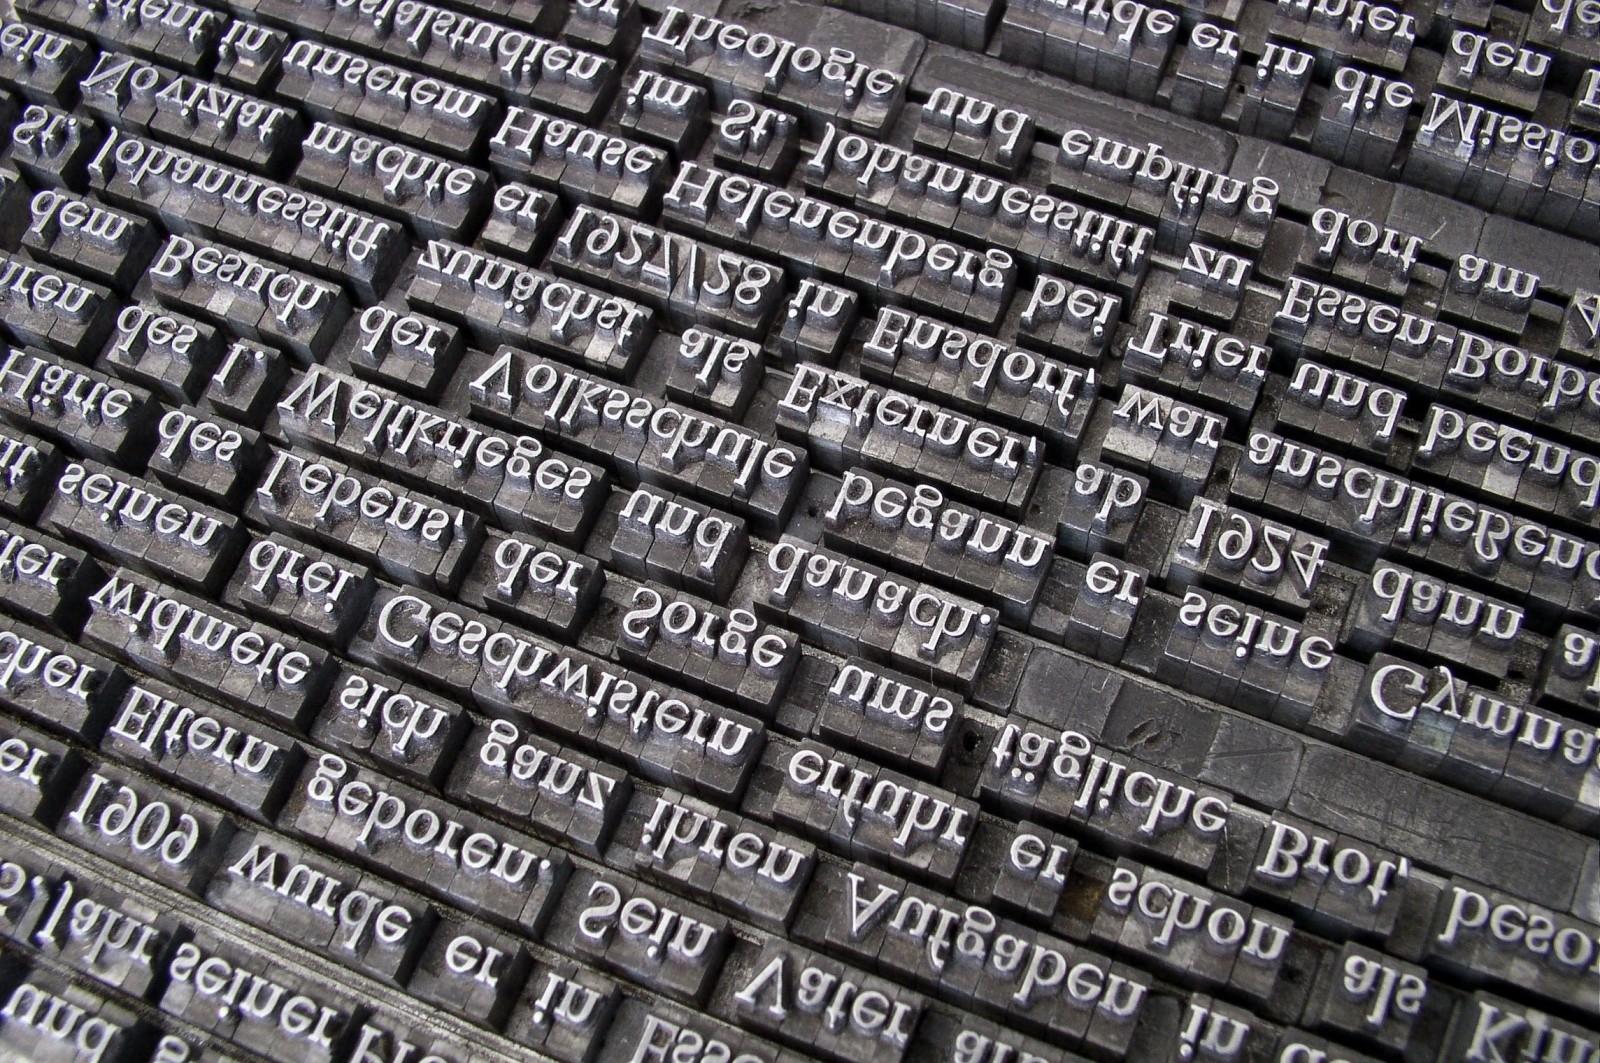 font-lead-set-book-printing-gutenberg-letters